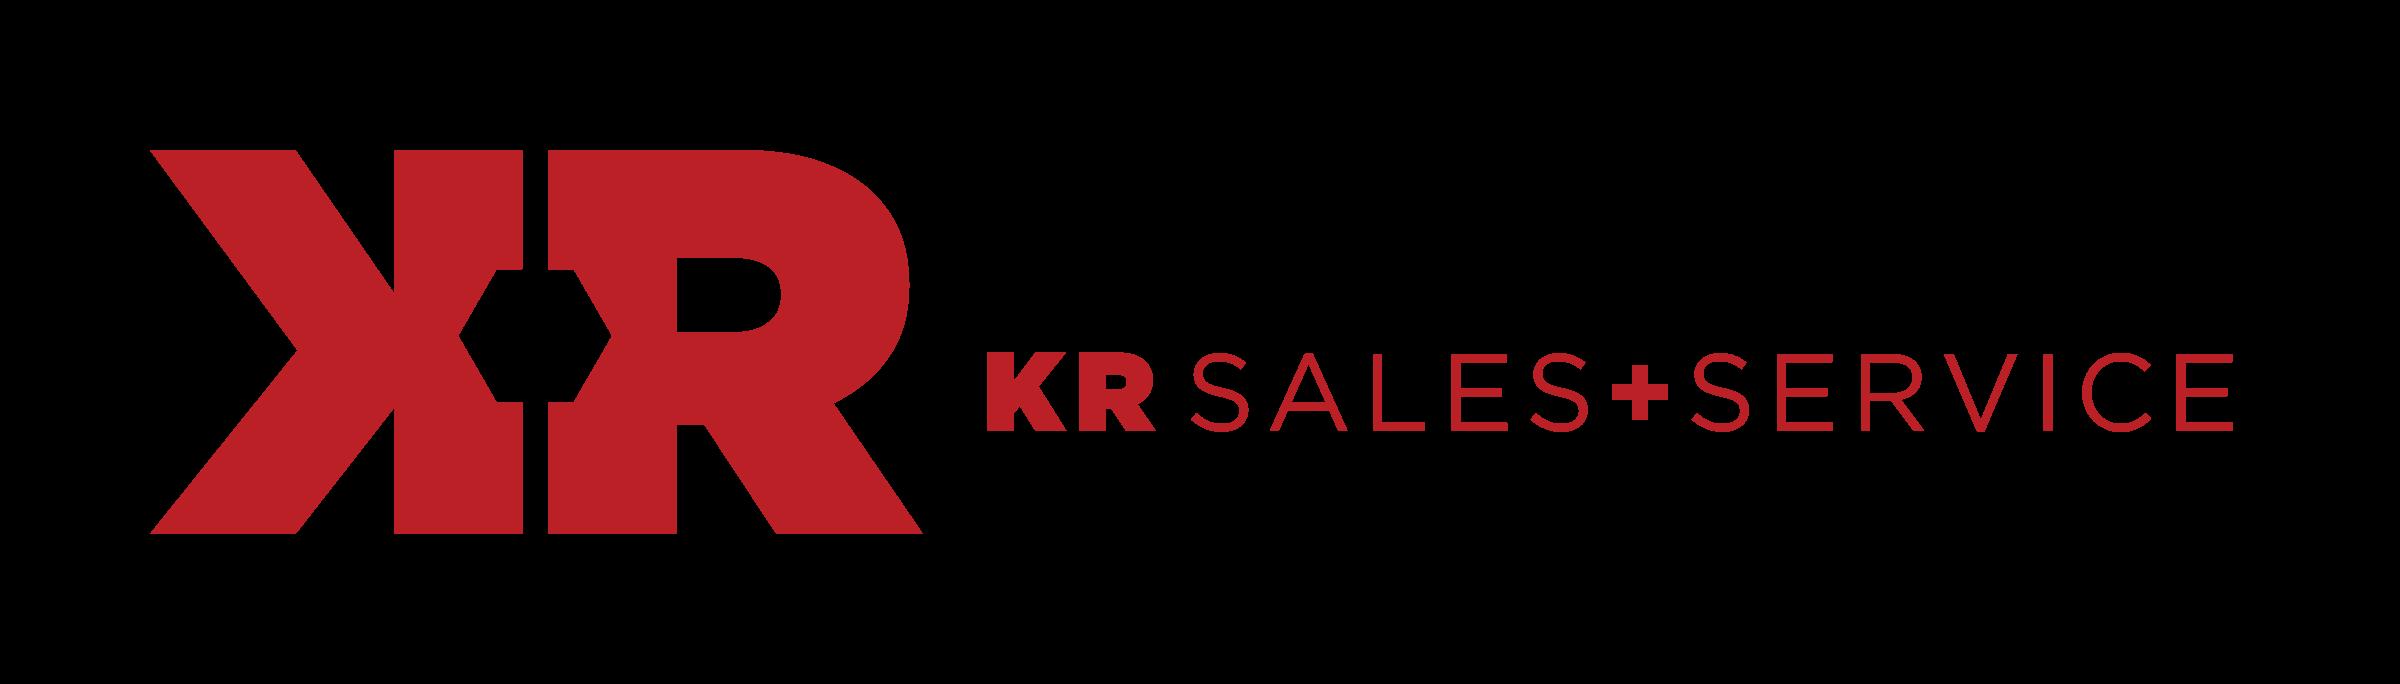 KR Sales + Service